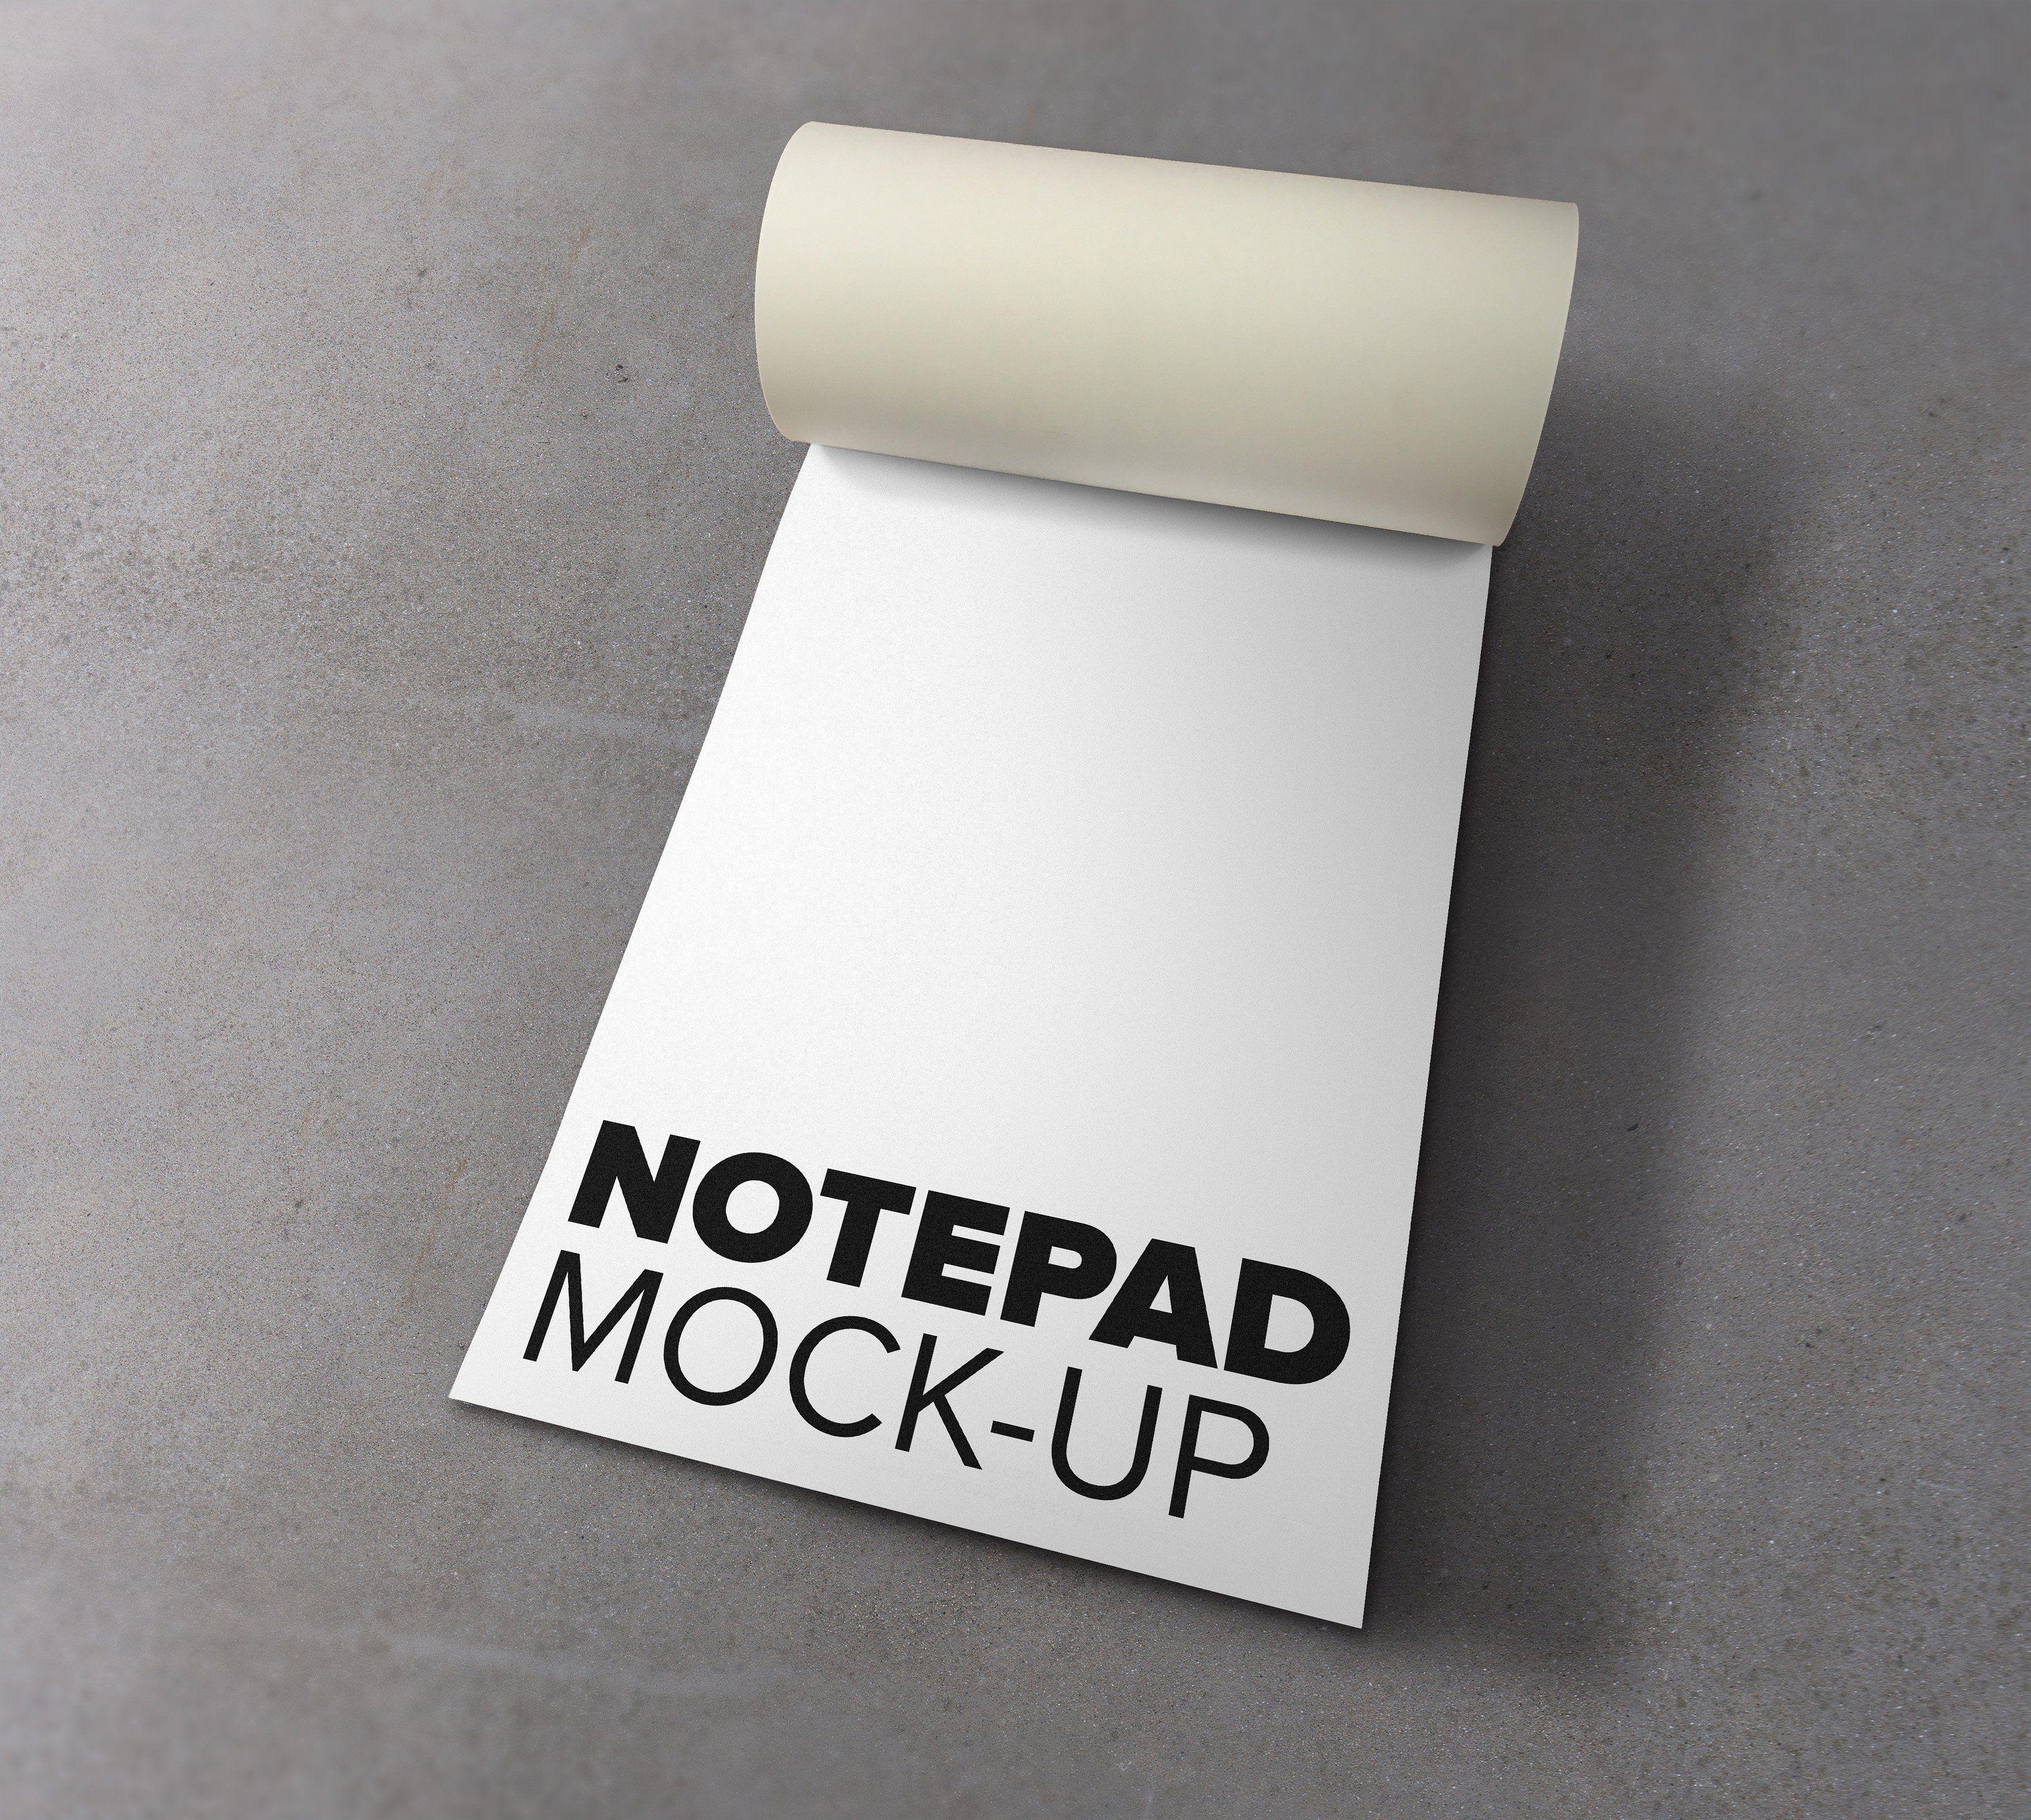 Download Notepad Mockup Mockup Free Psd Psd Template Free Note Pad